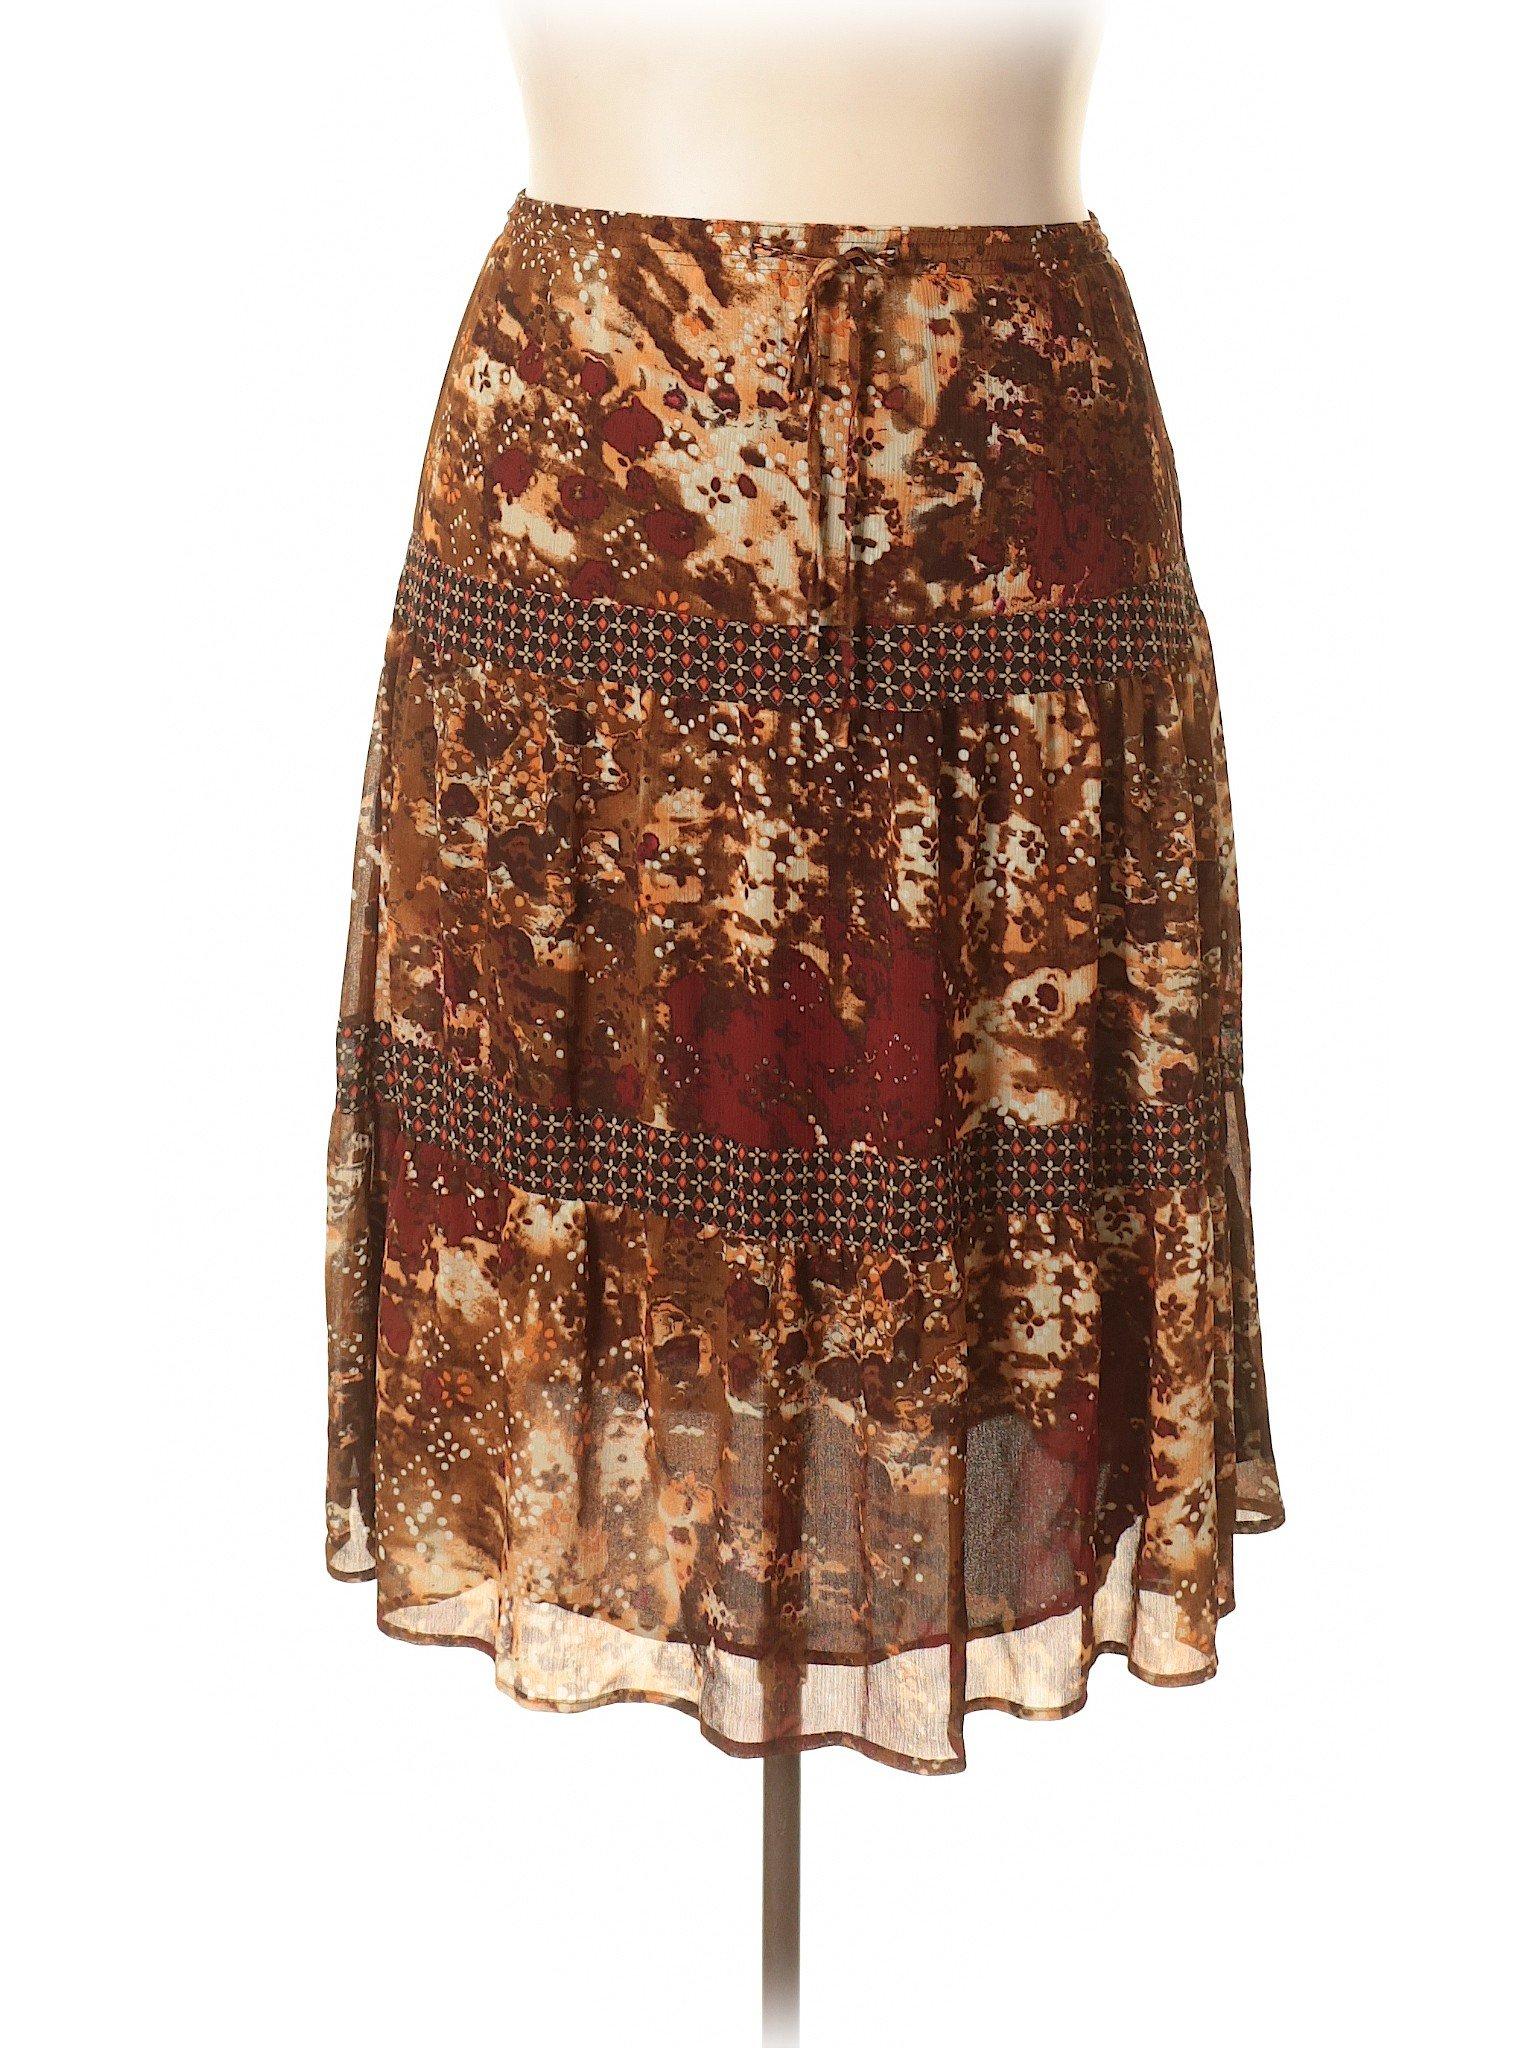 Sam Boutique Hilu's Casual Skirt Classic leisure CSSFnw8B5